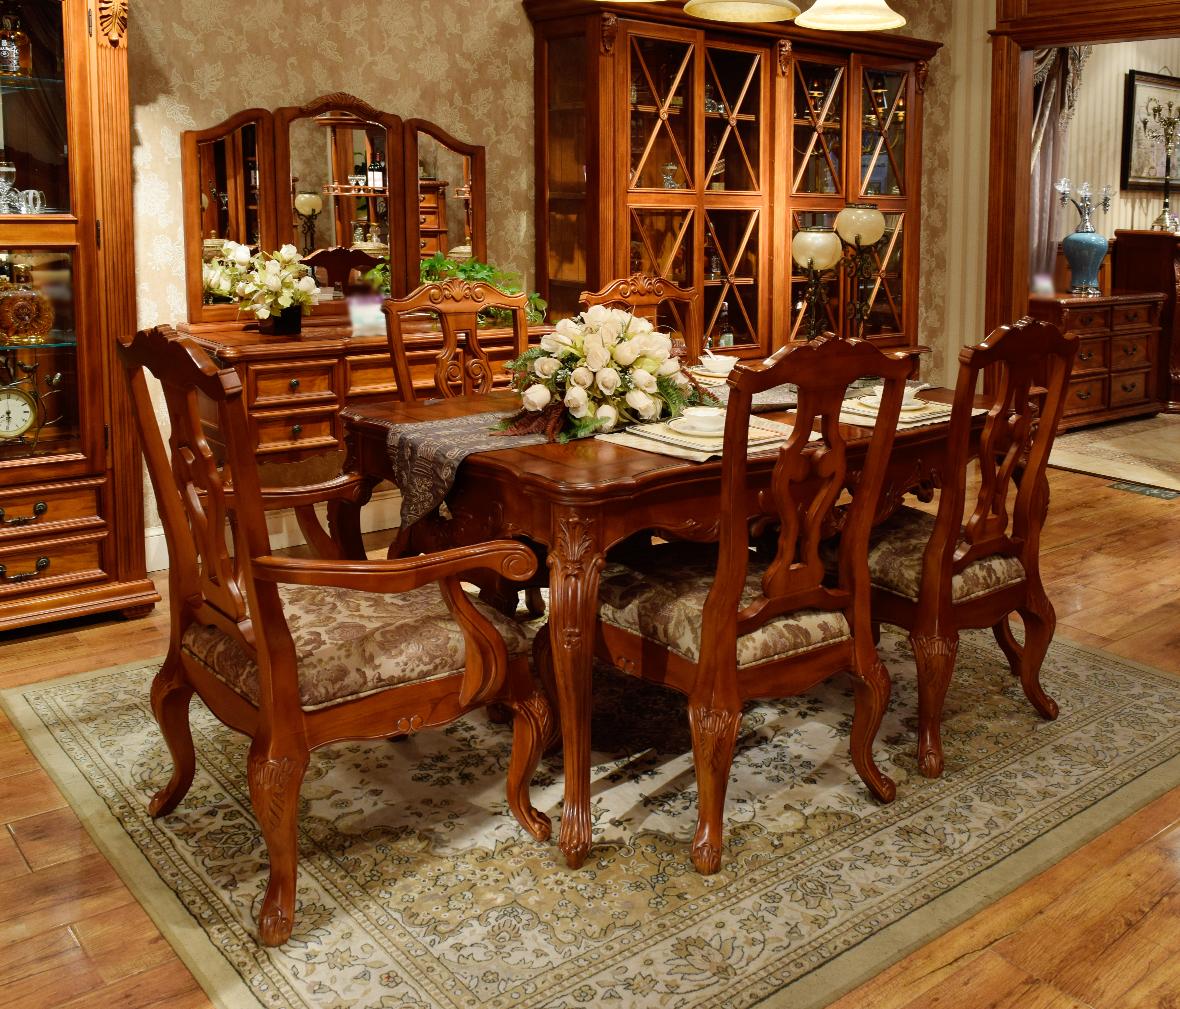 x7511-21型号美式古典实木扶手餐椅 百年工艺打造  眼缘:0  赖氏家具图片